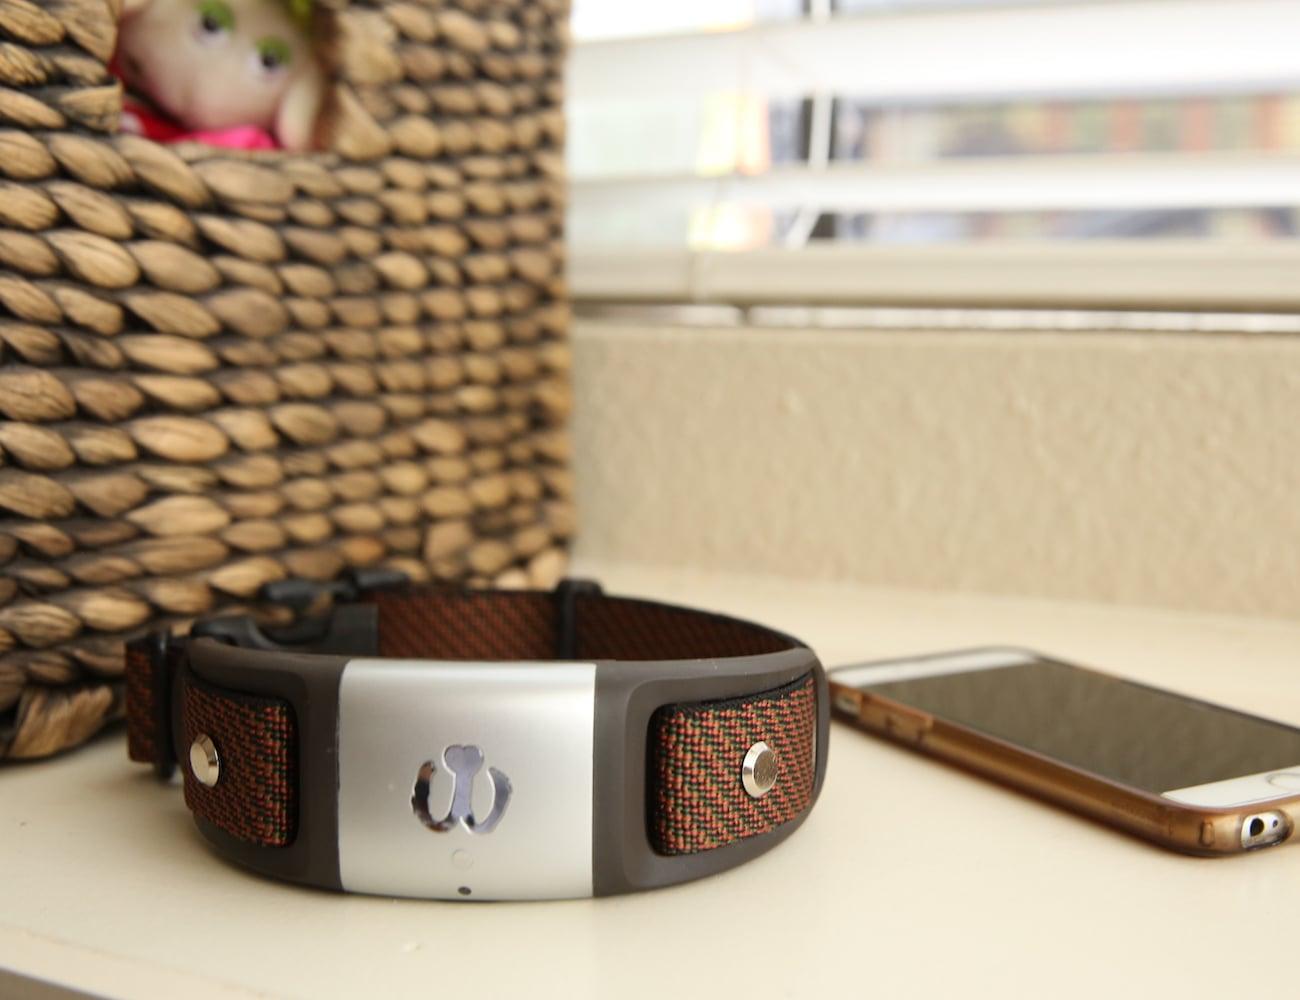 Waggit Smart Dog Health Wearable